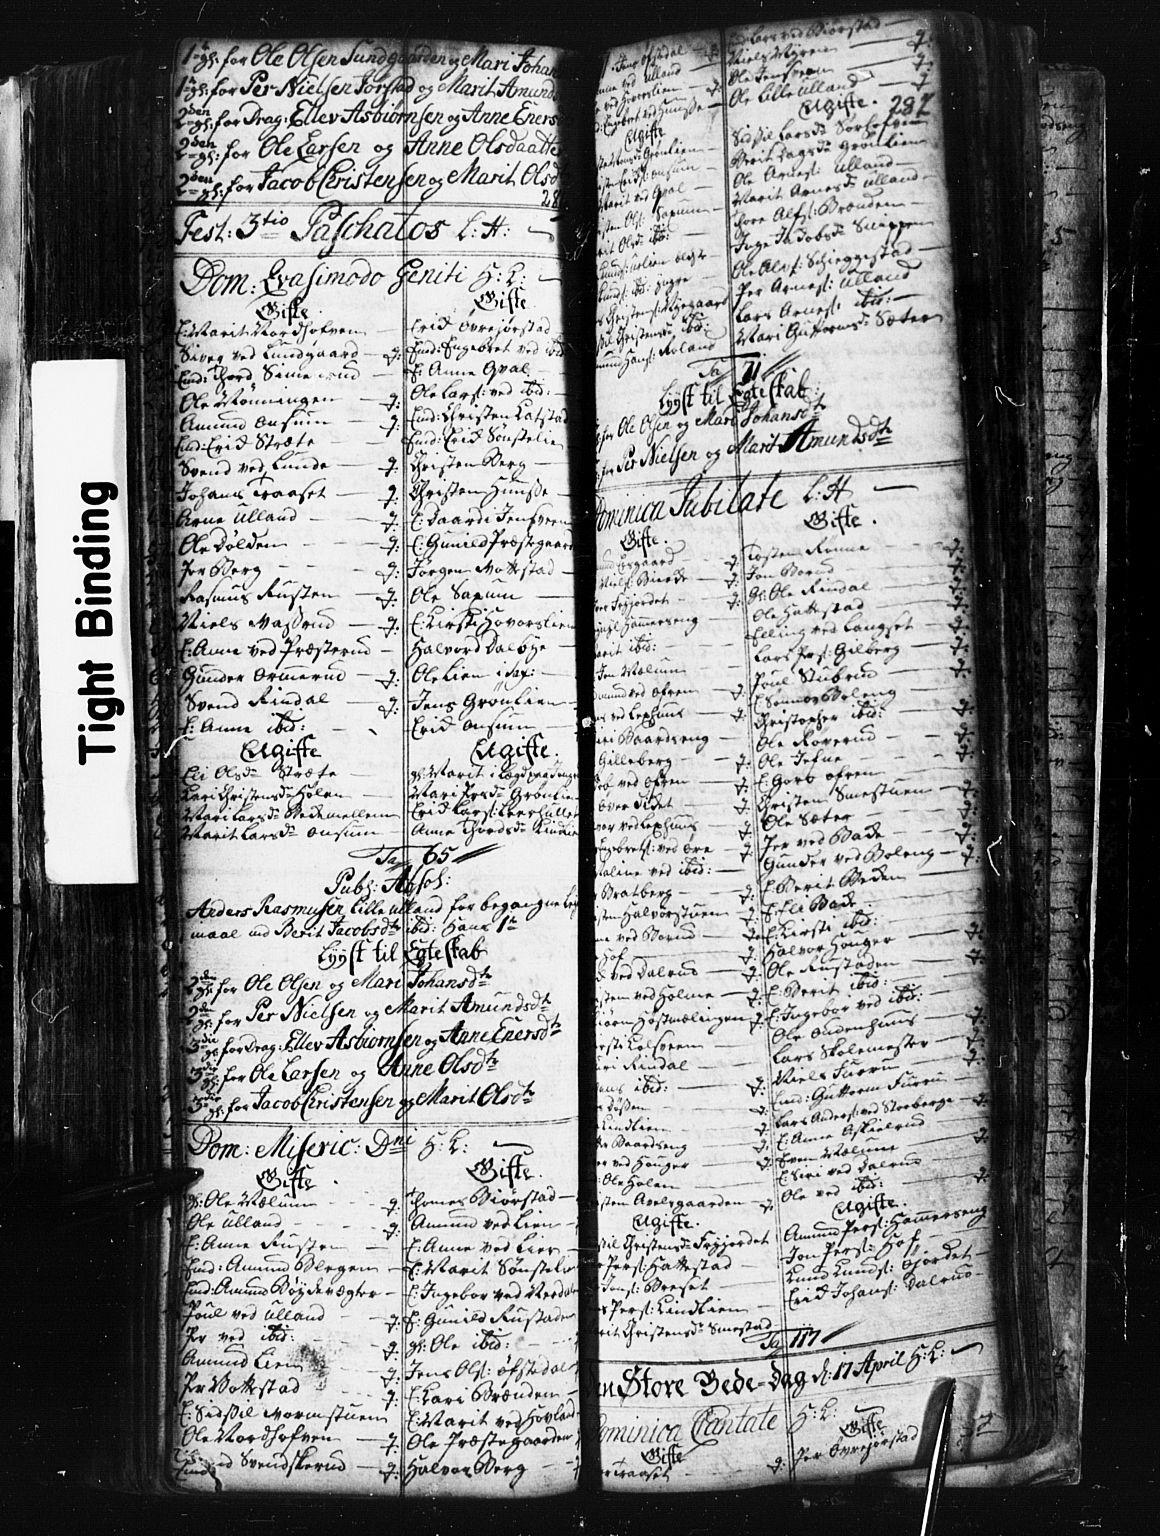 SAH, Fåberg prestekontor, Klokkerbok nr. 1, 1727-1767, s. 286-287